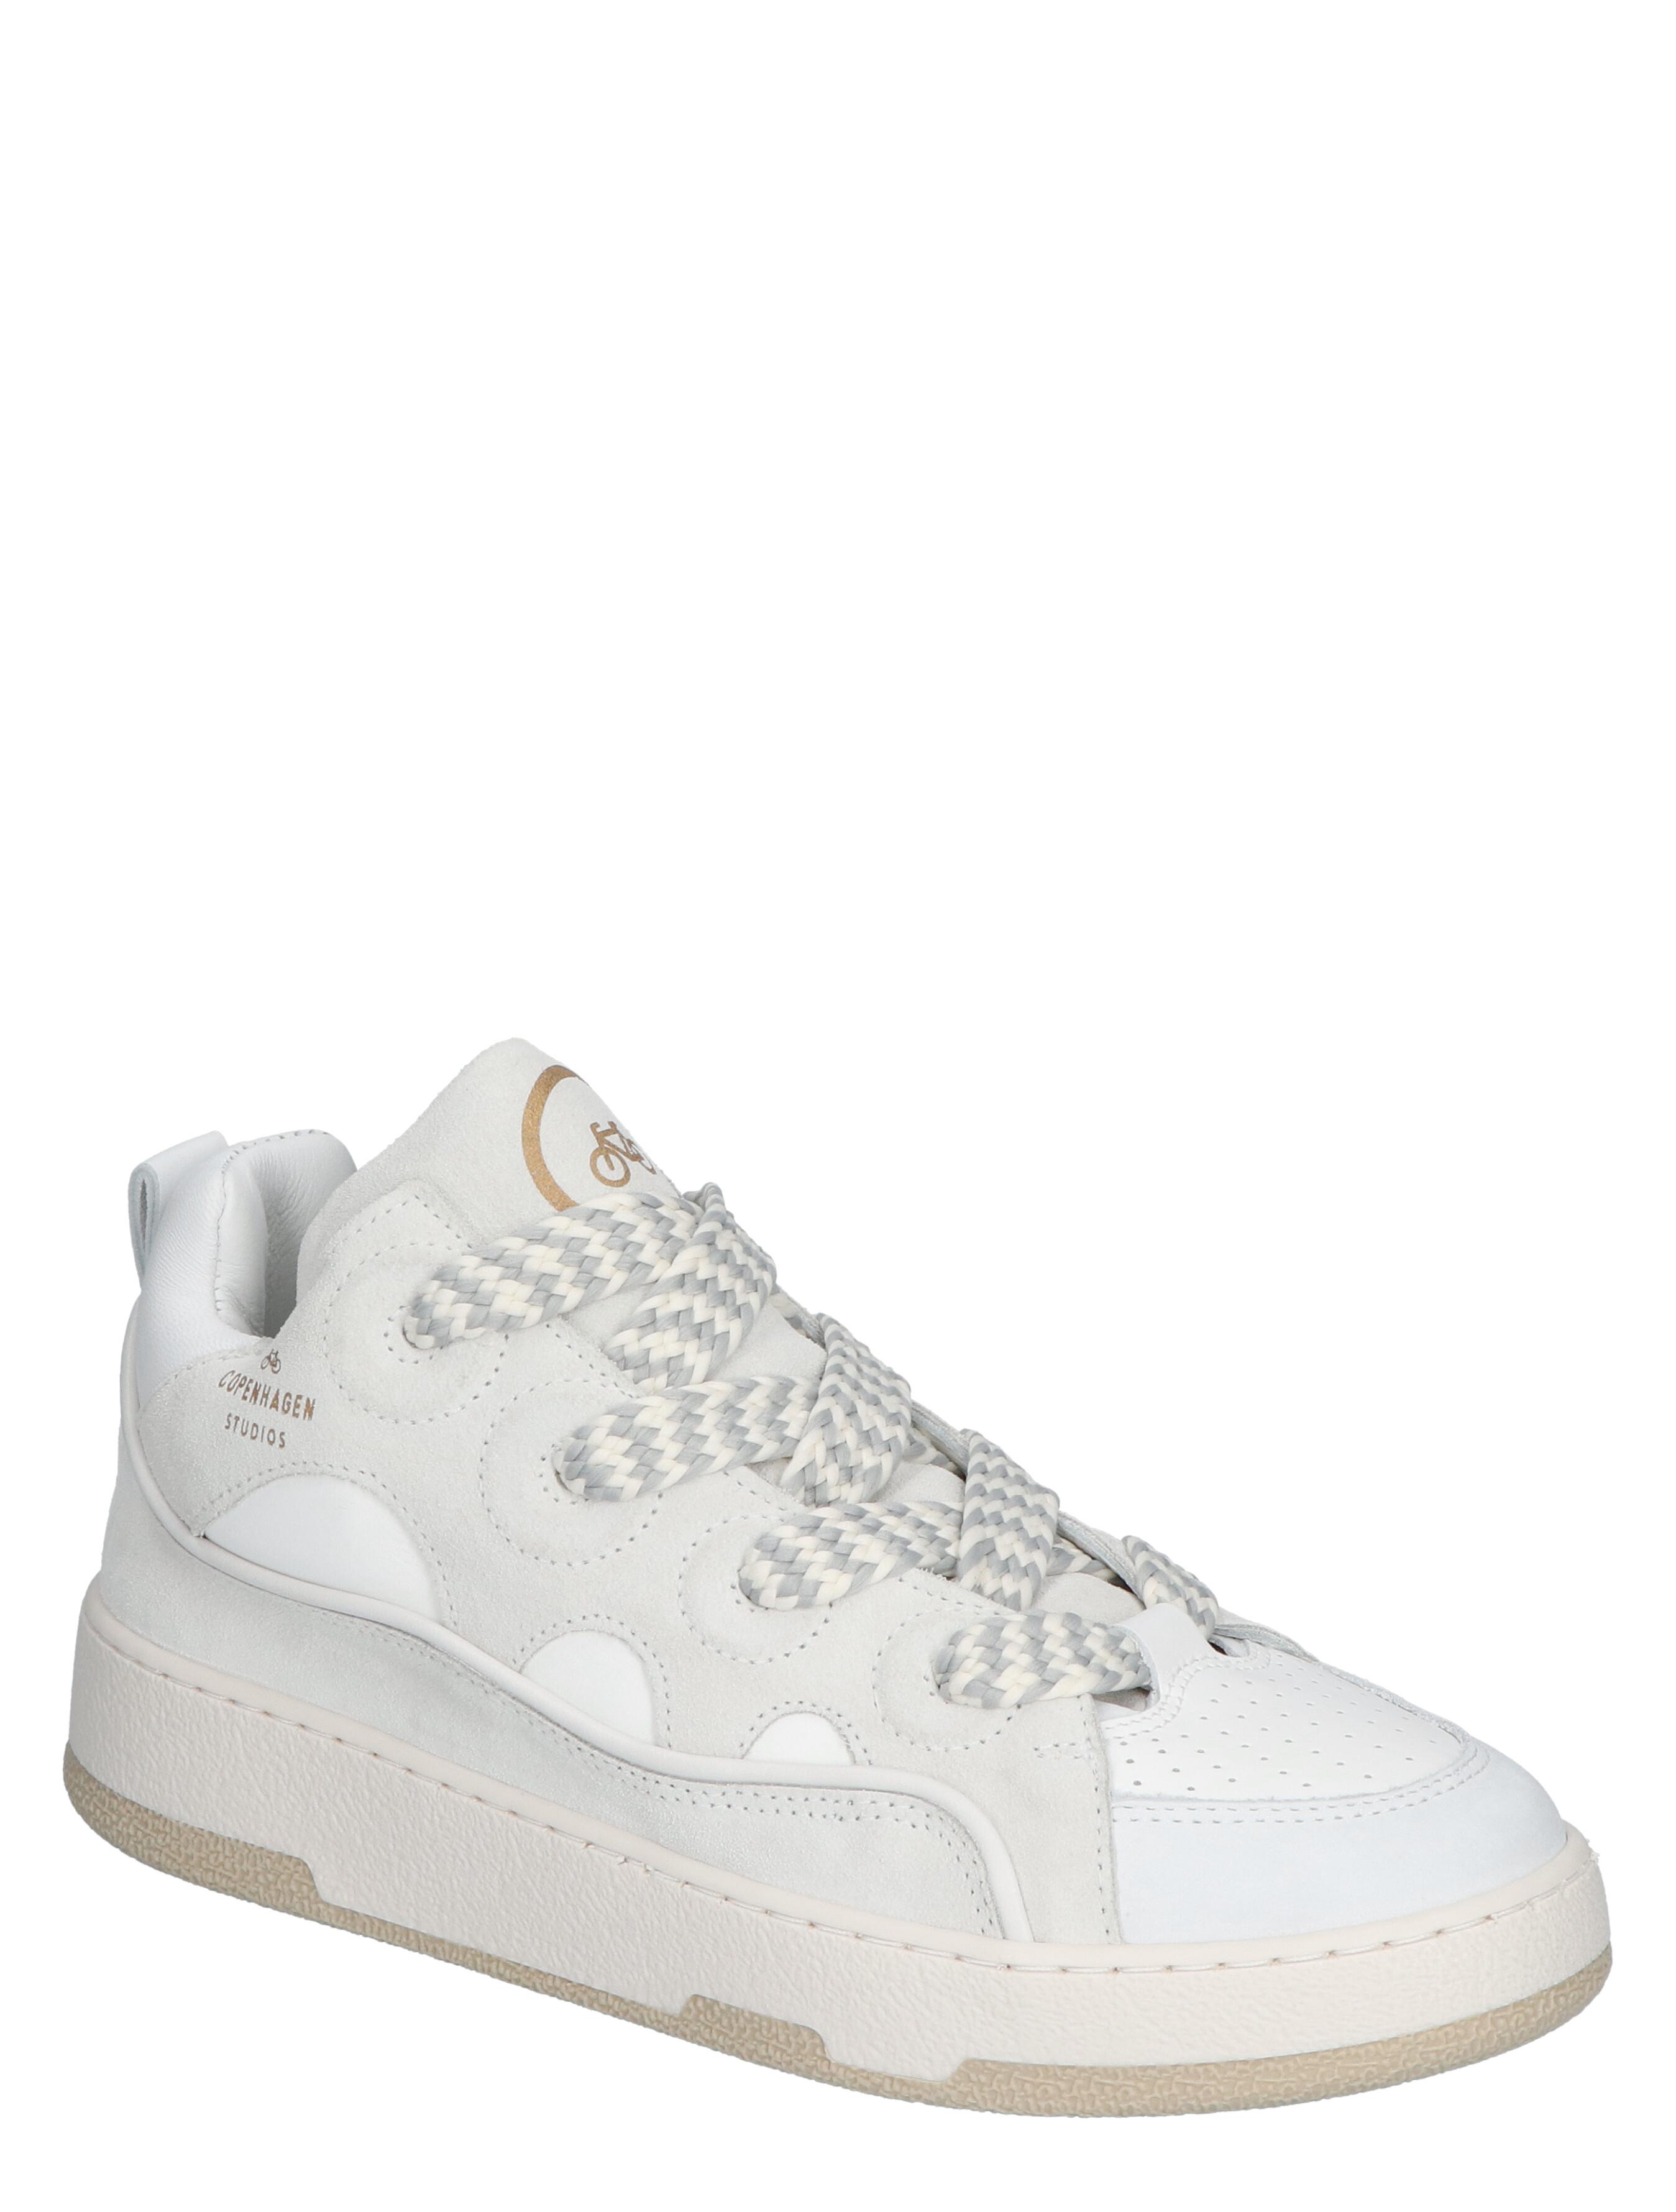 Copenhagen CPH 201 Leather Mix White Lage sneakers